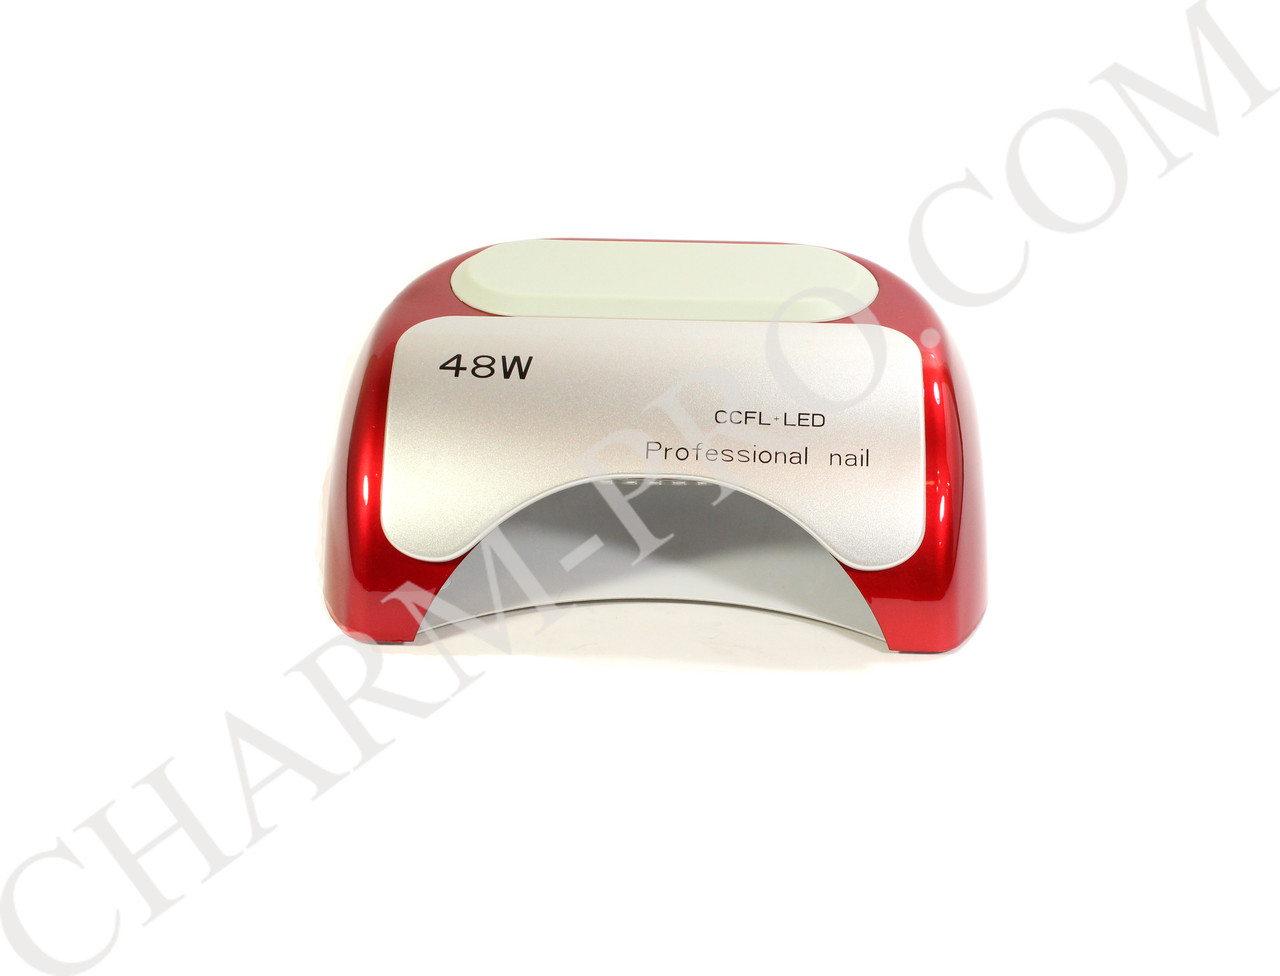 Лампа для запікання гель лаку Professional Nail LED+CCFL 48W (червона)